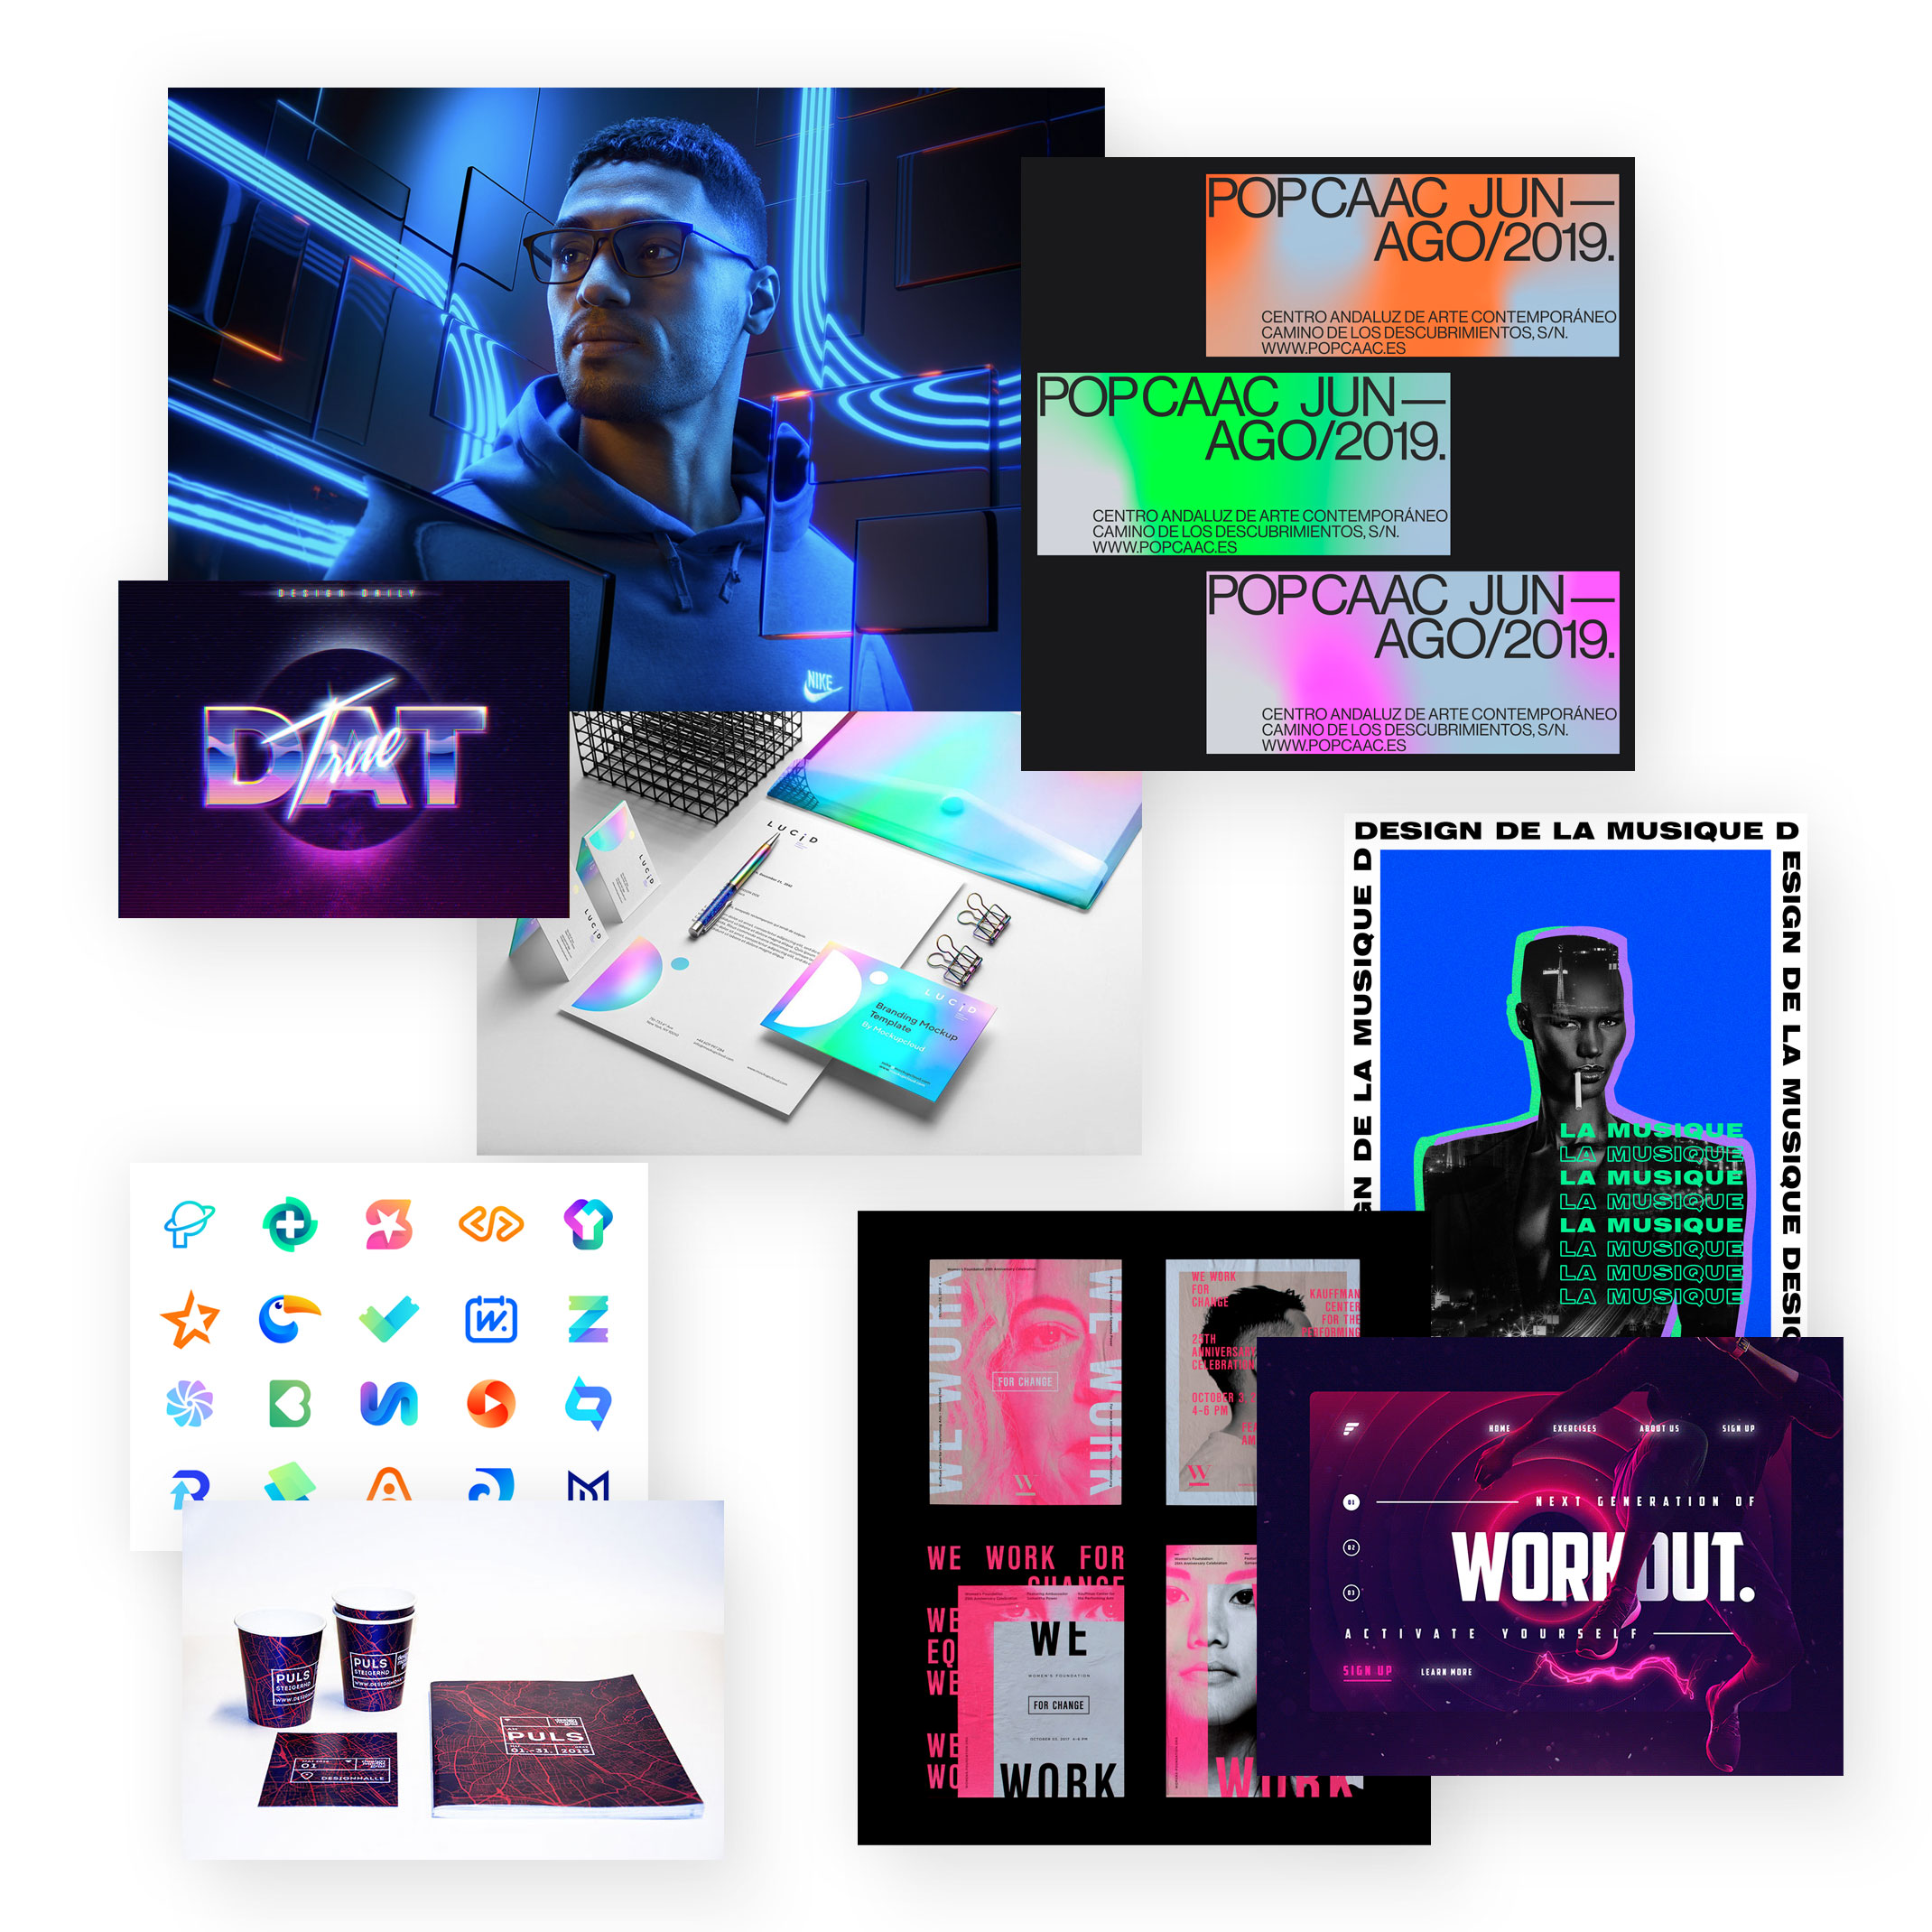 Neon-Farben